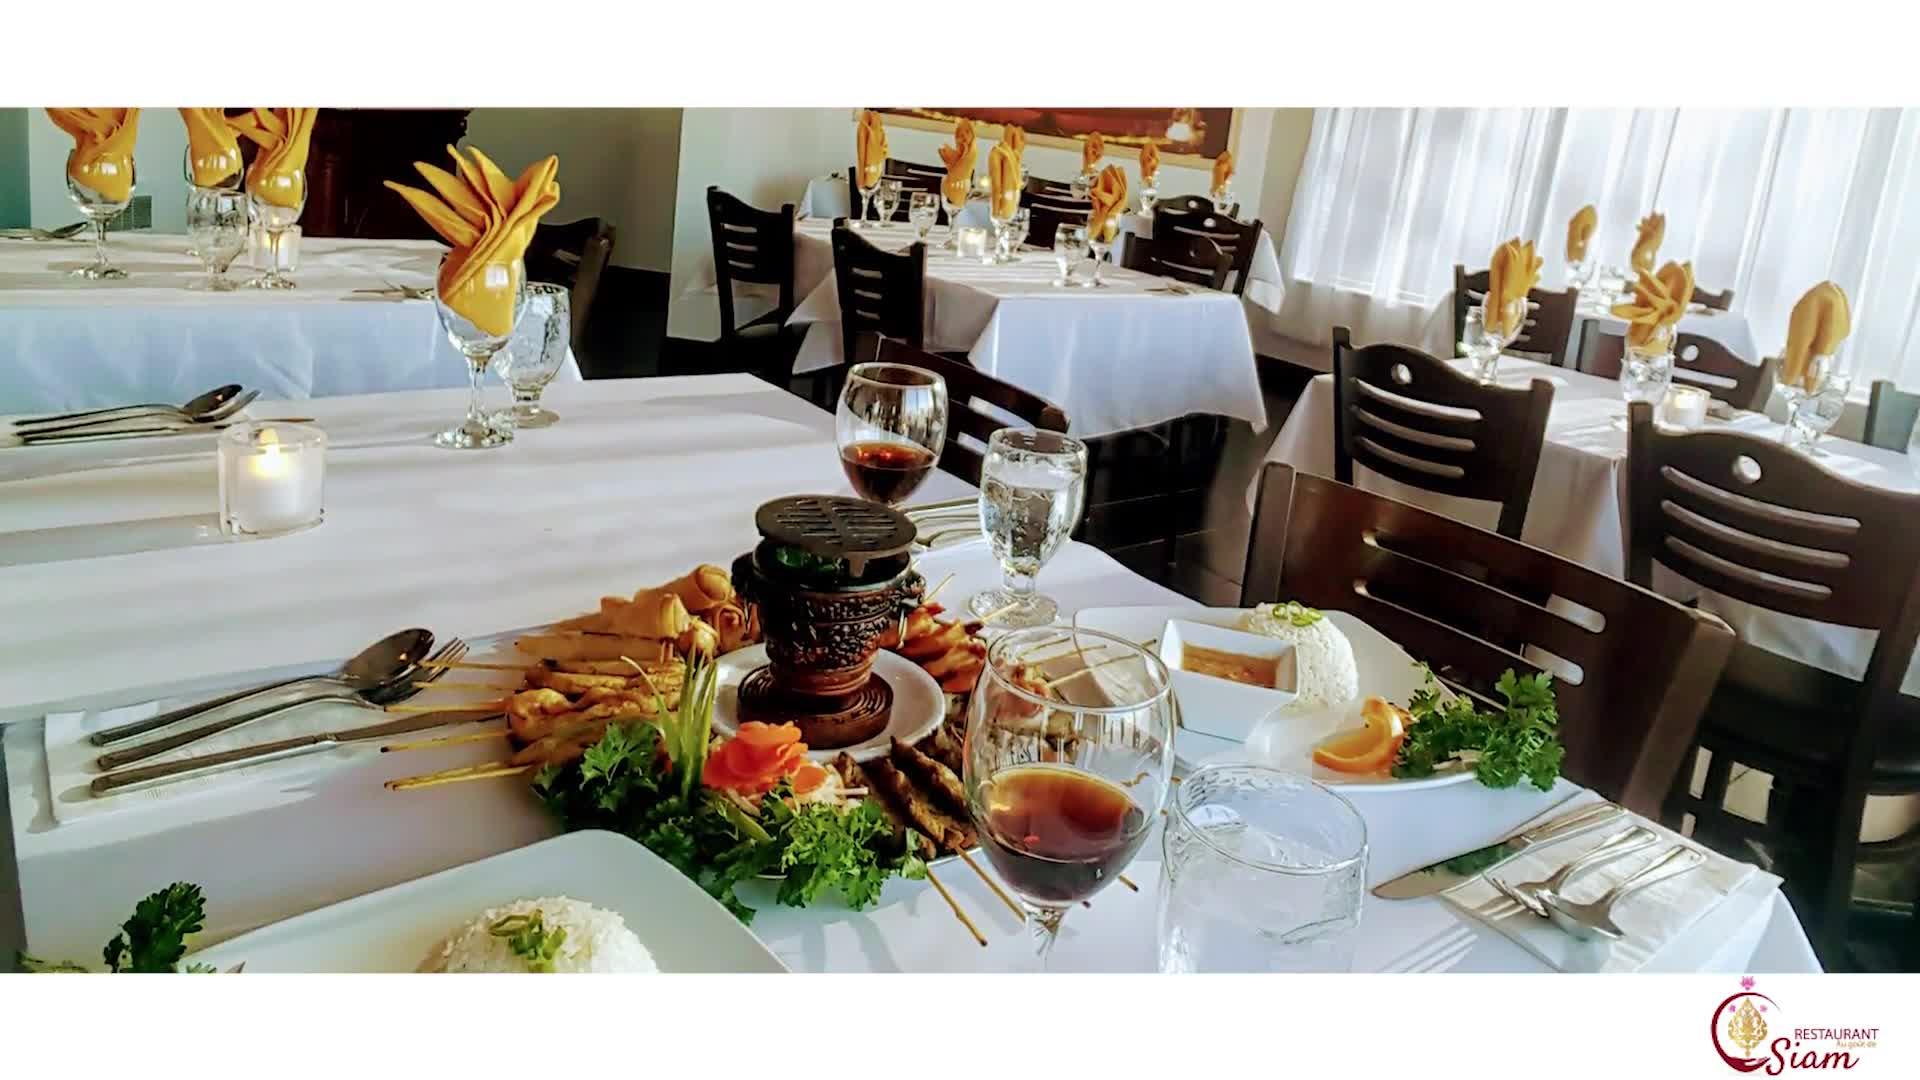 Restaurant Au Goût de Siam - Restaurants chinois - 4505090518